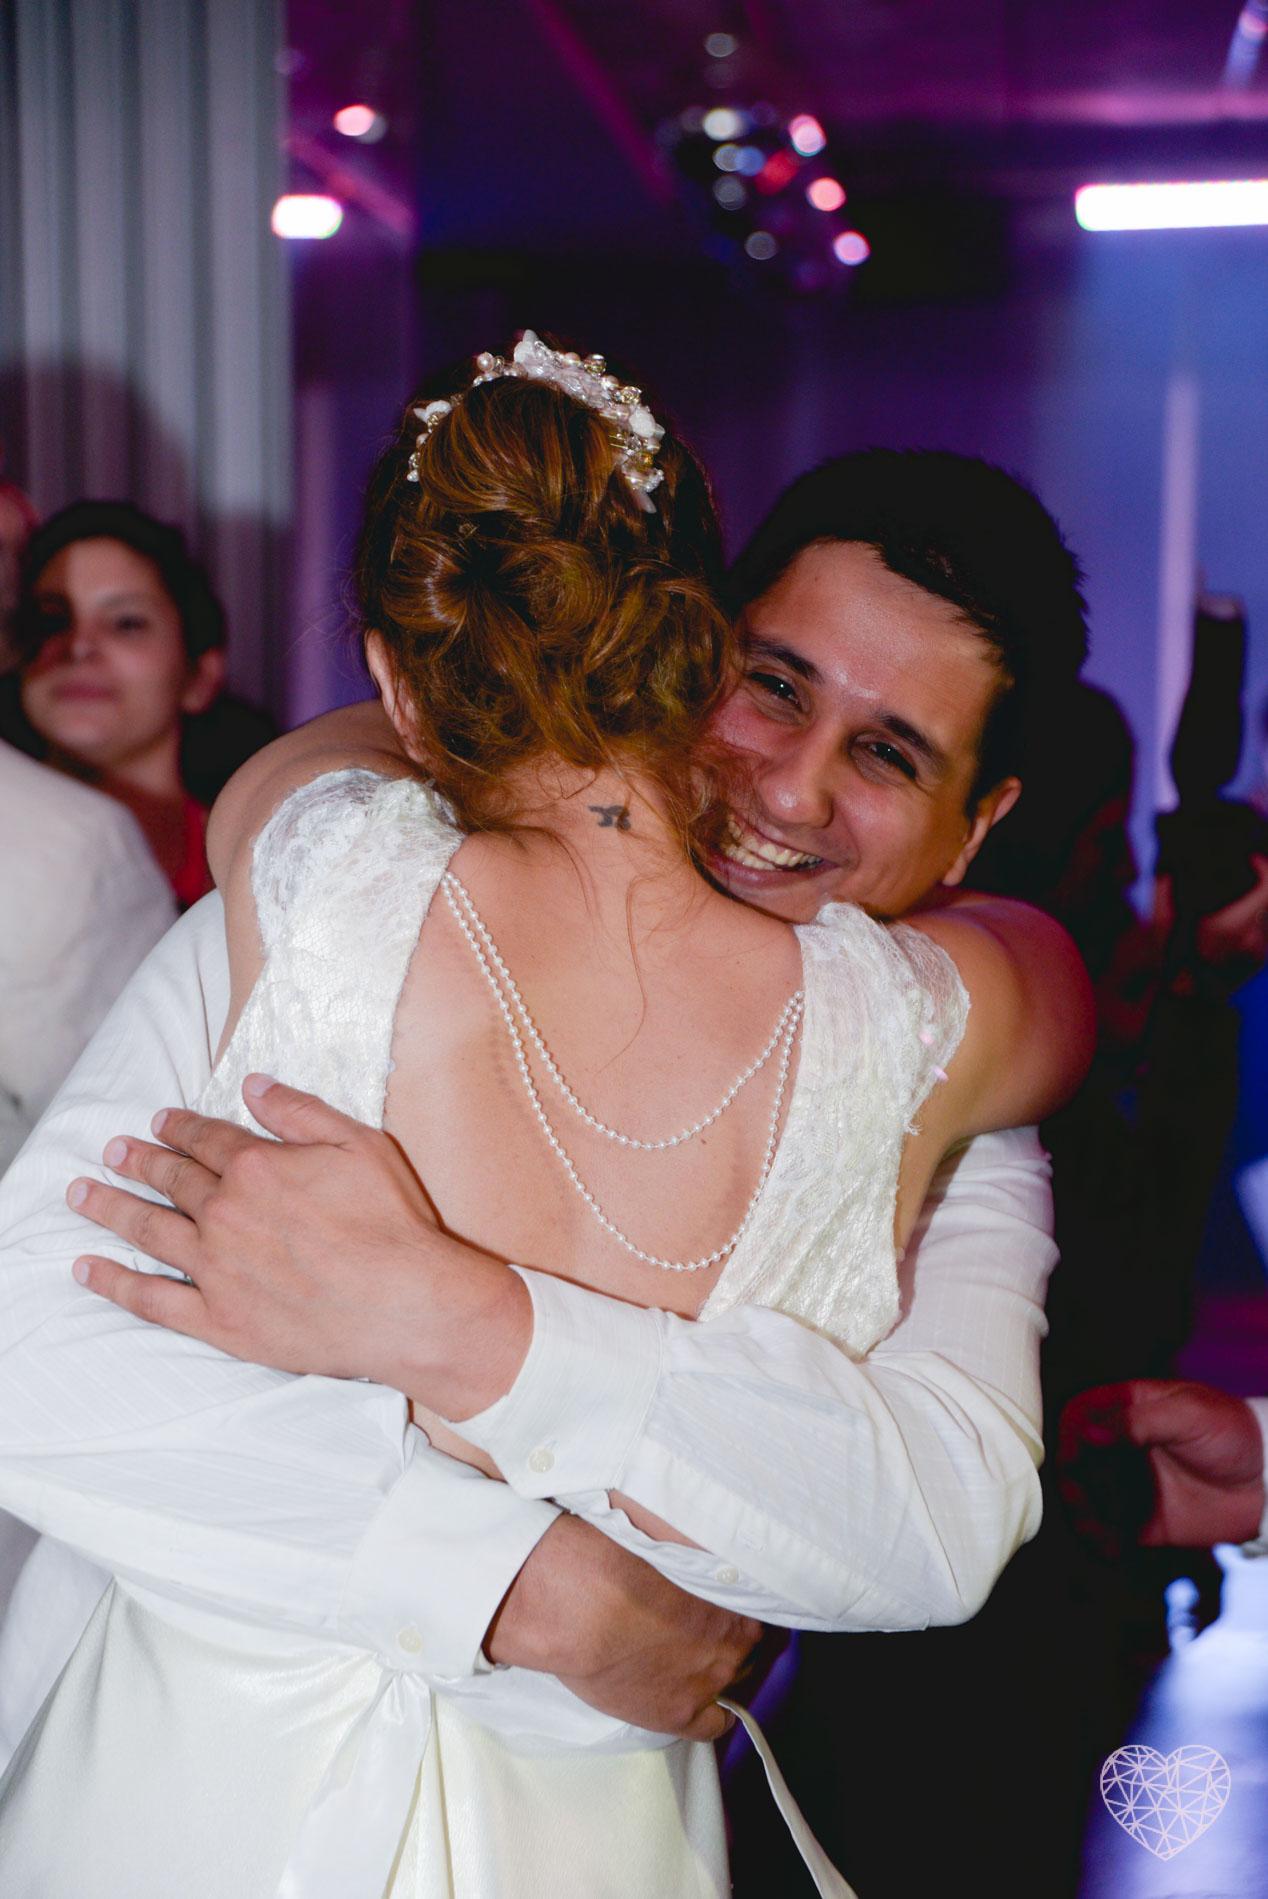 lovelyphoto.wedding - fiesta - wedding photography